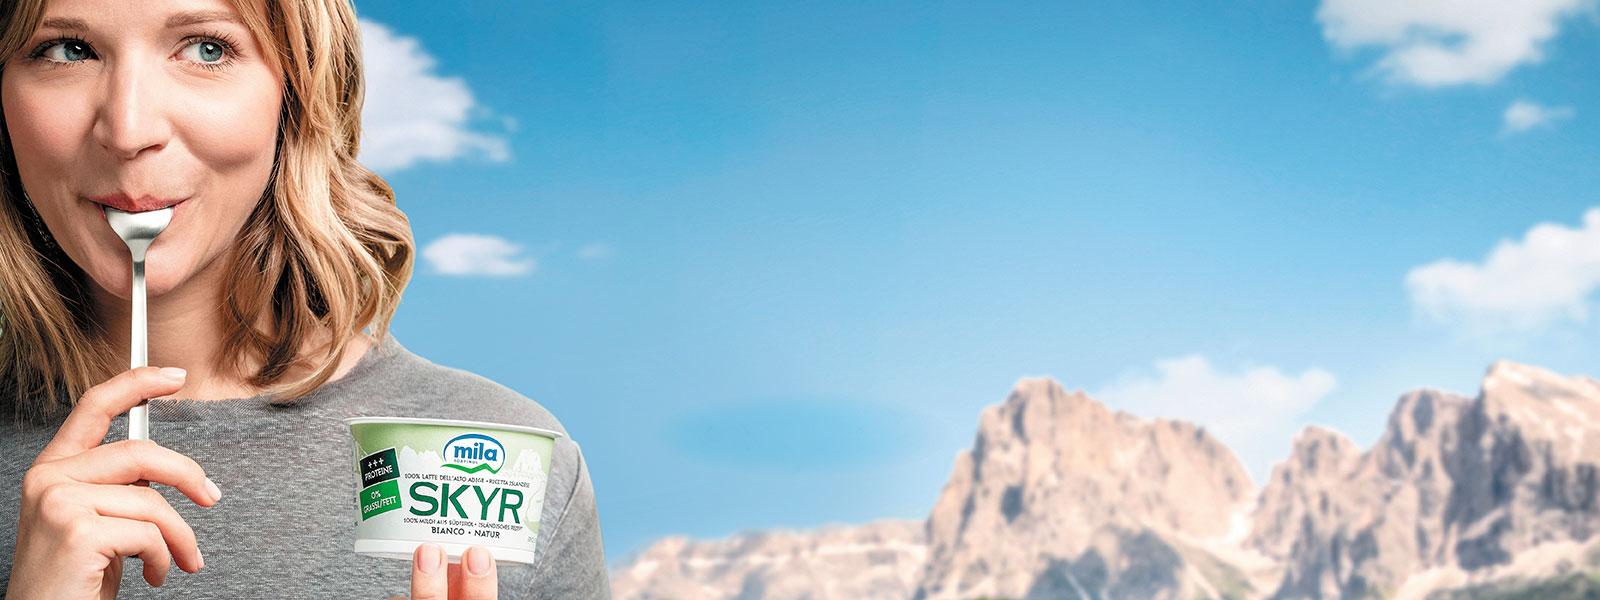 Eine Frau isst Skyr Natur in Südtirol